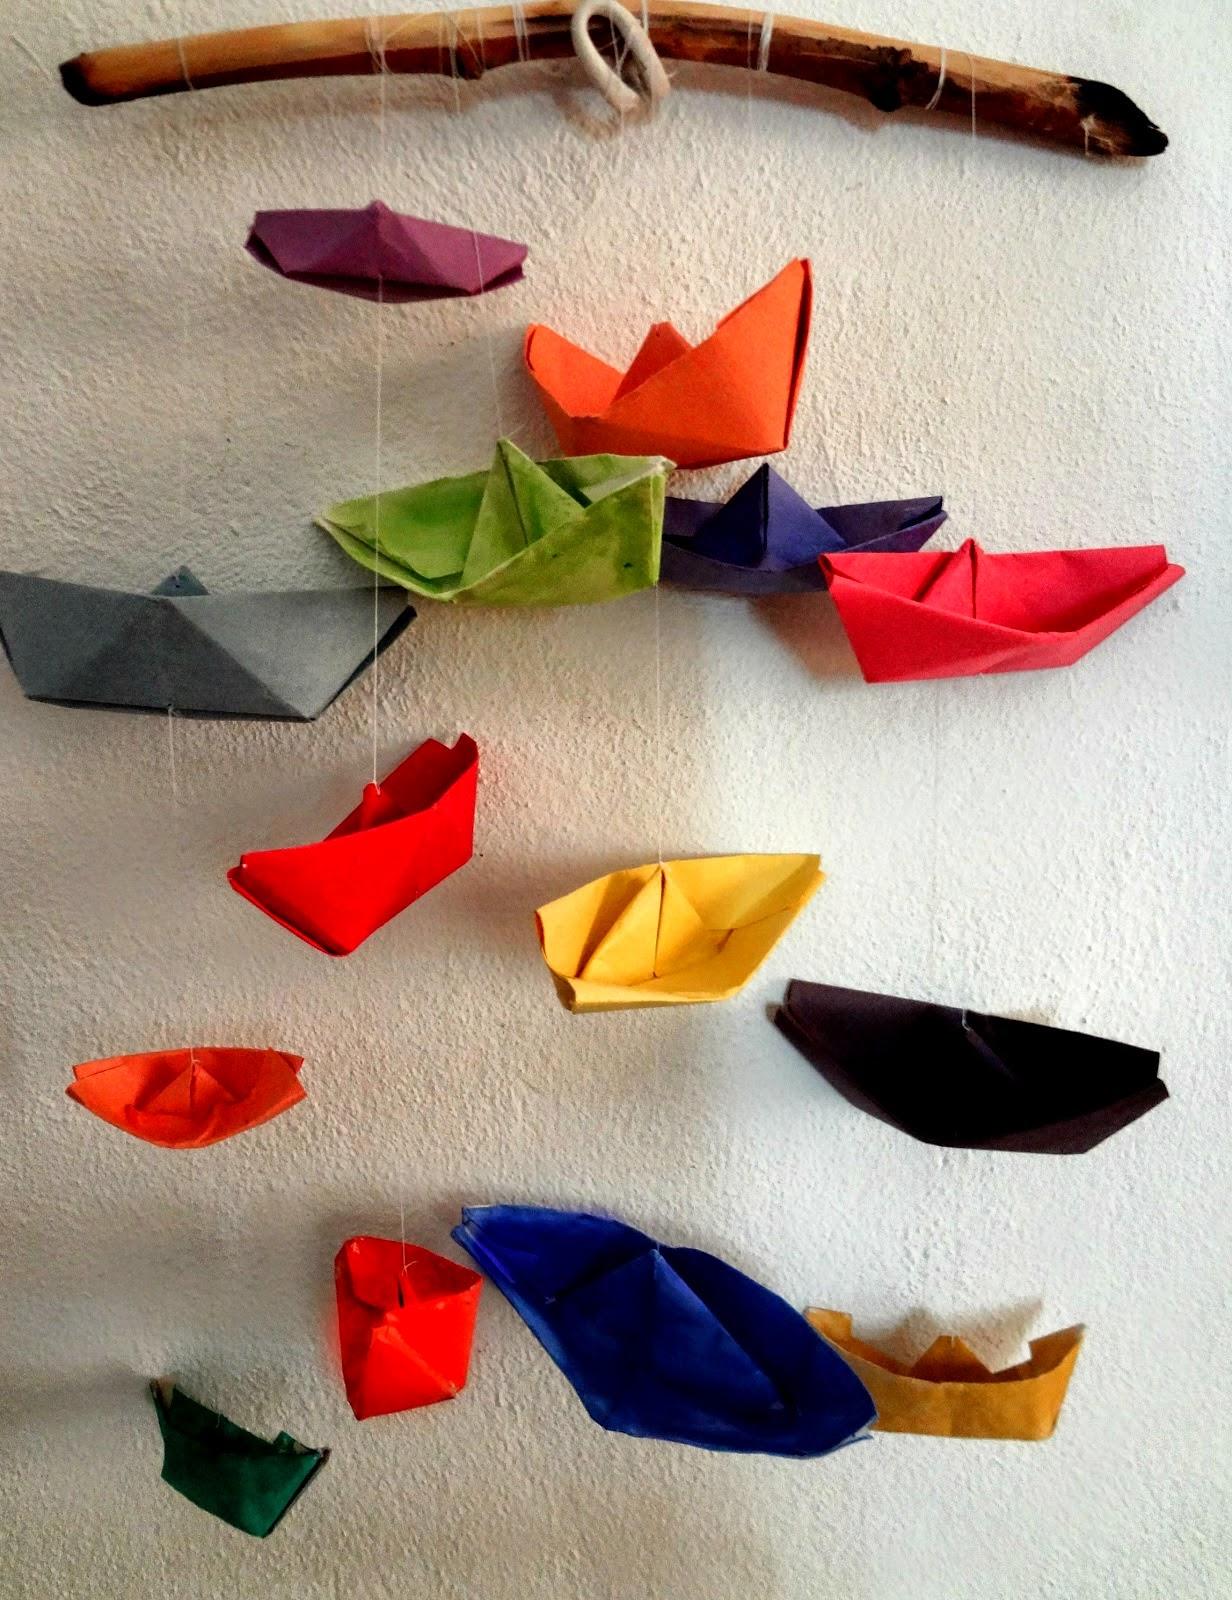 http://thelittletreasures.blogspot.gr/2014/07/driftwood-hanger-for-paper-boats.html